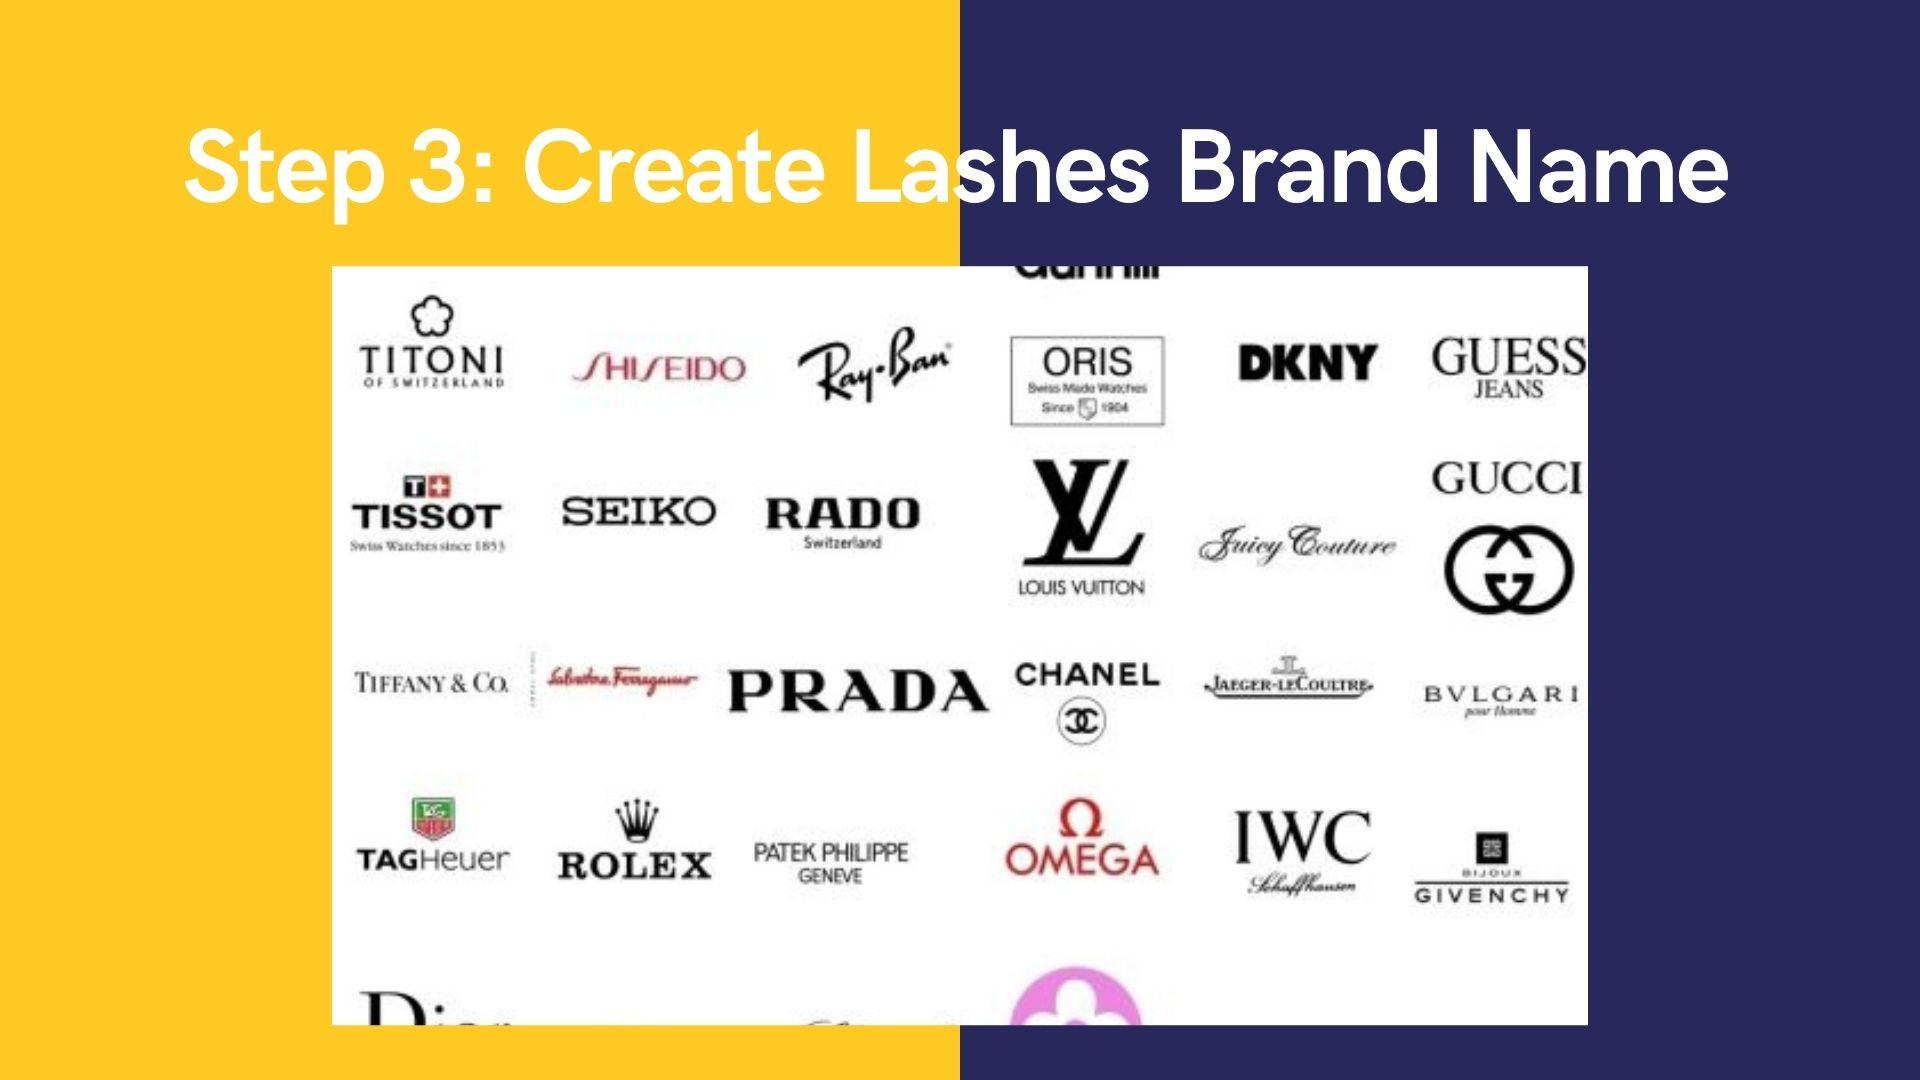 Step 3 Create Lashes Brand Name